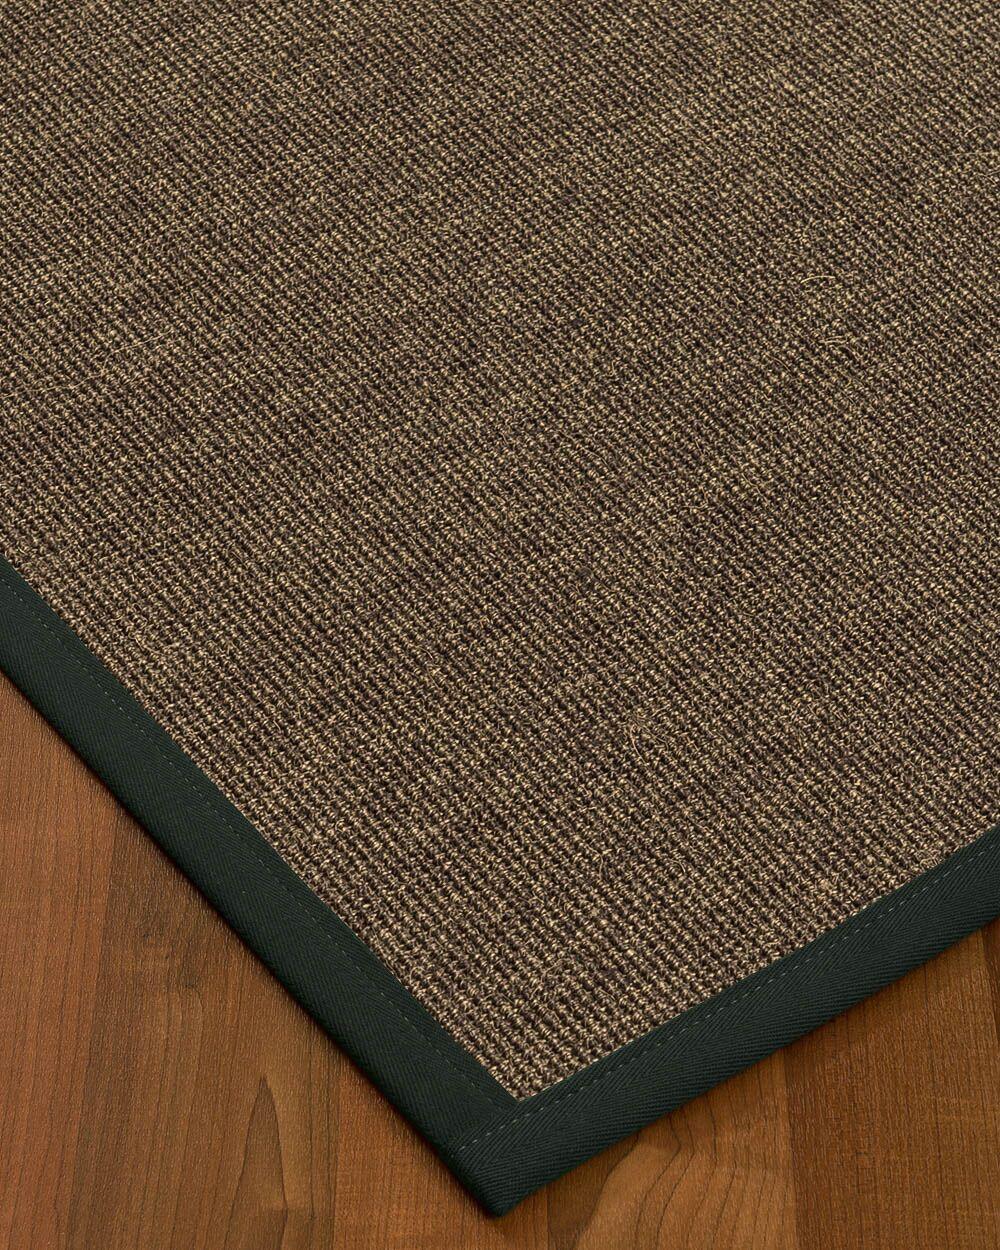 Bafford Hand-Woven Black Area Rug Rug Size: Rectangle 12' x 15'